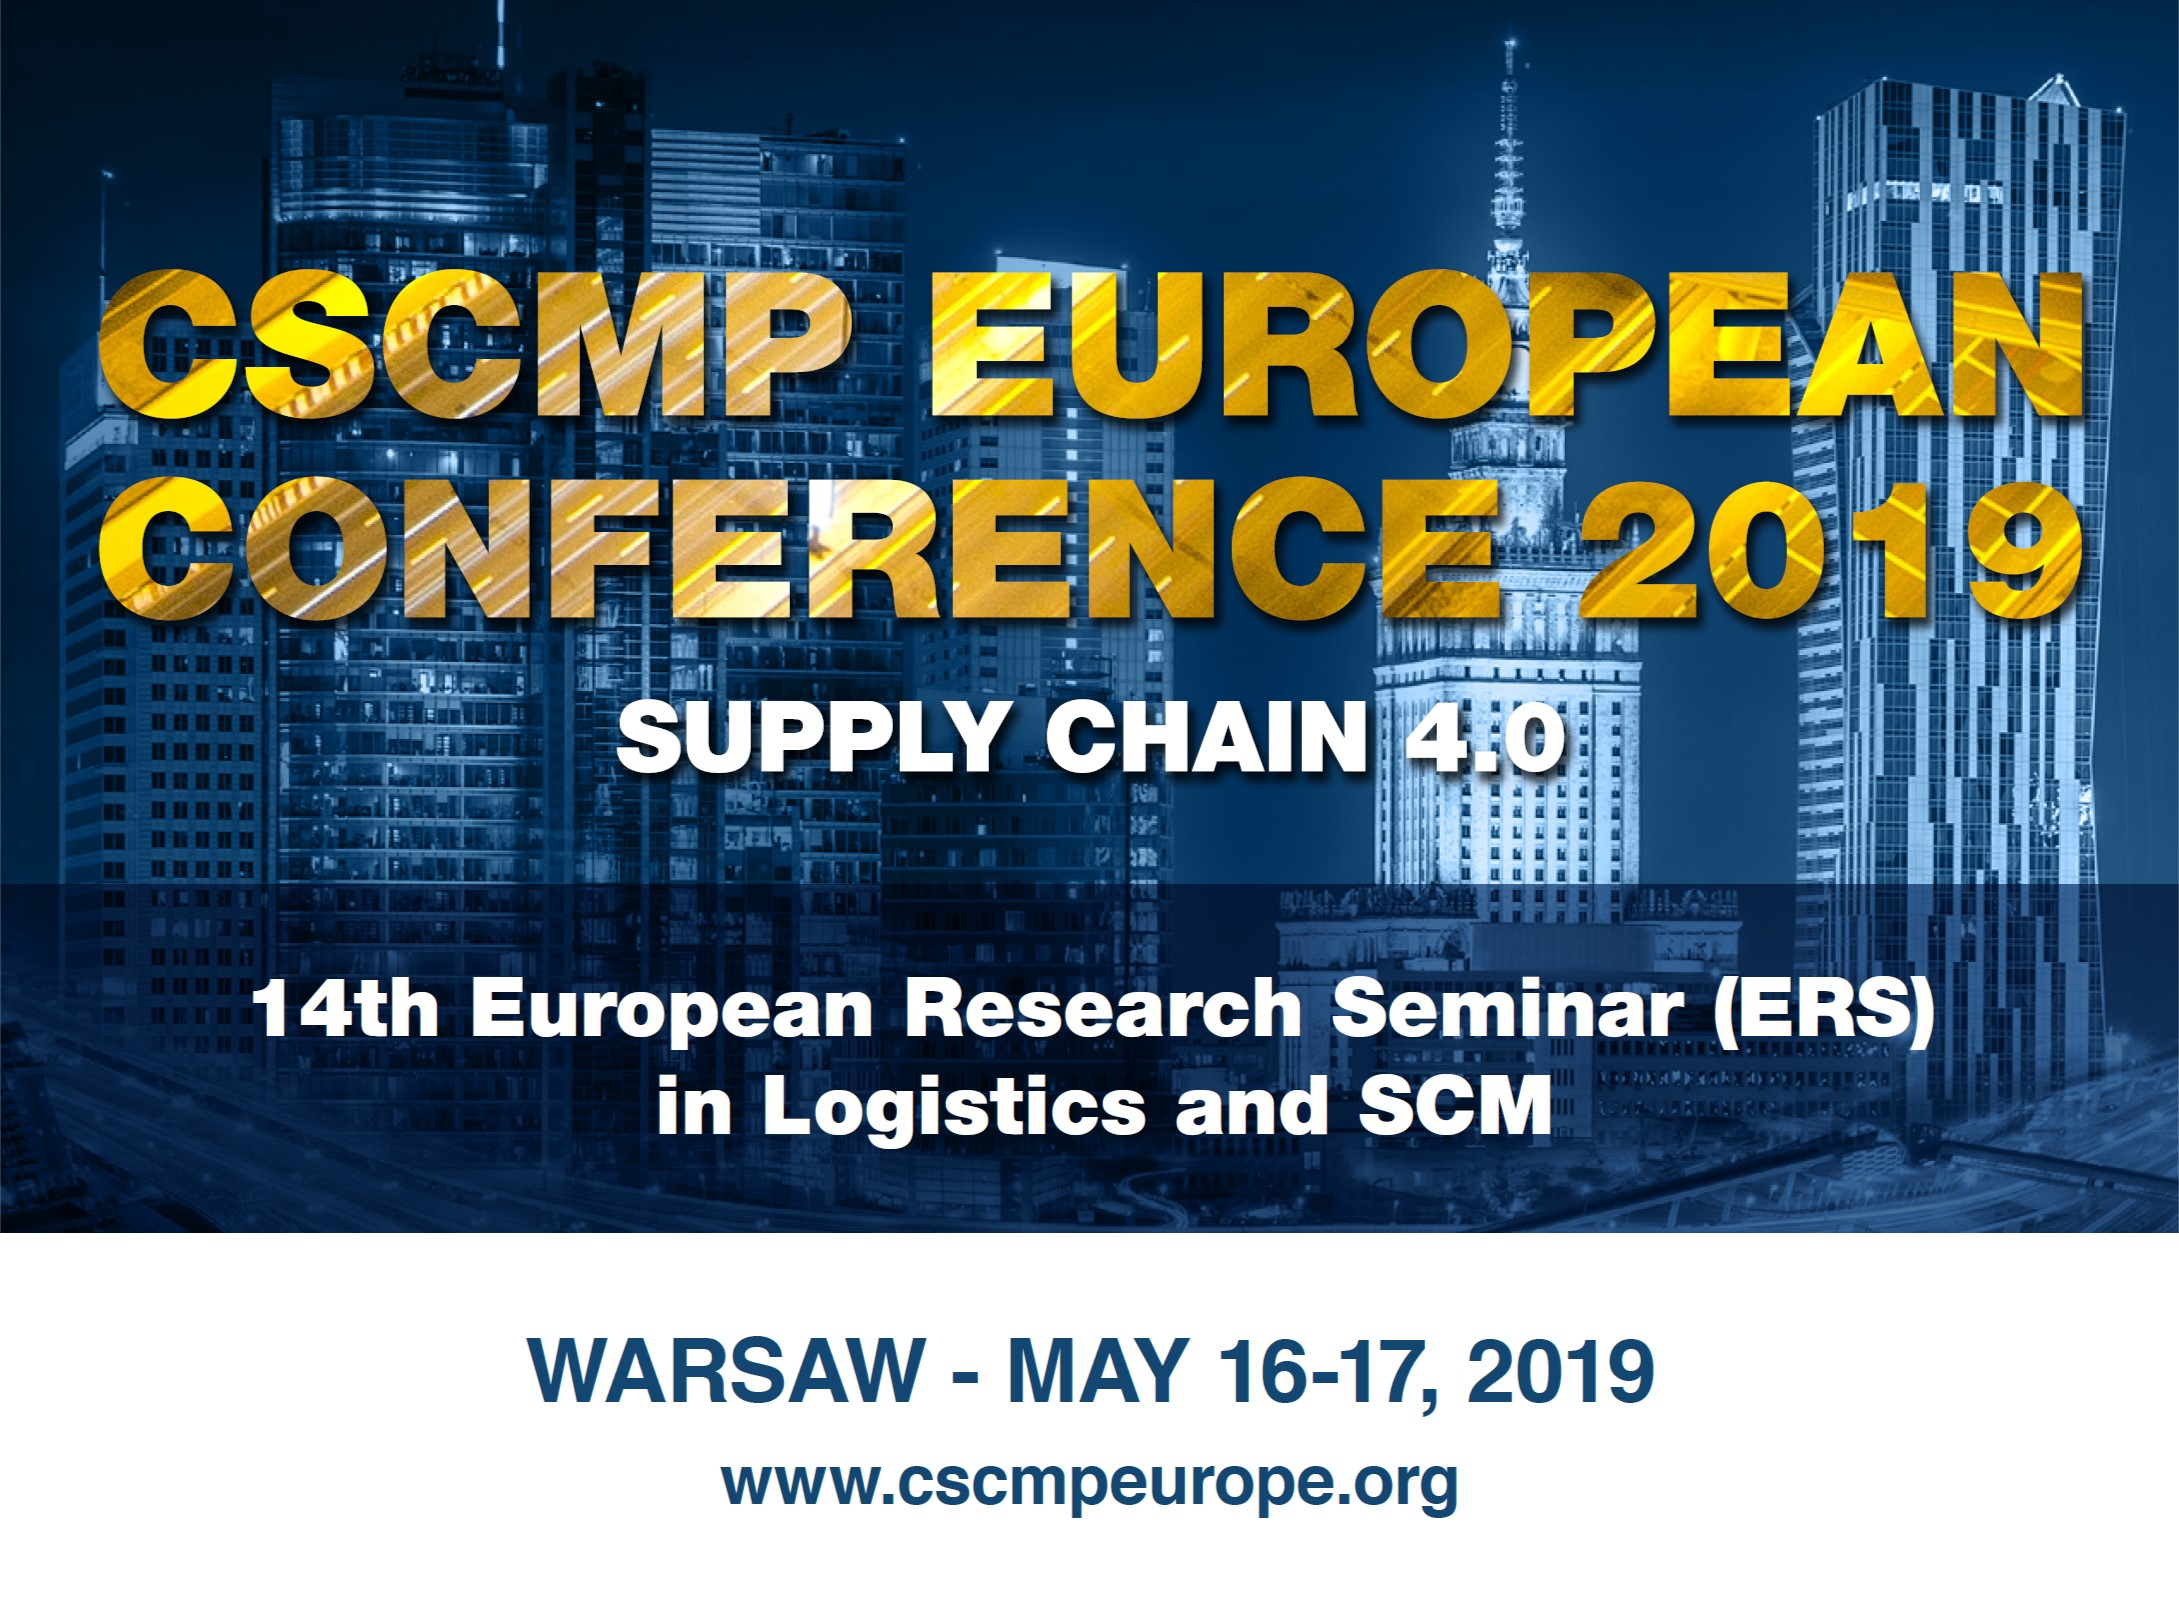 CSCMP European Conference 2019